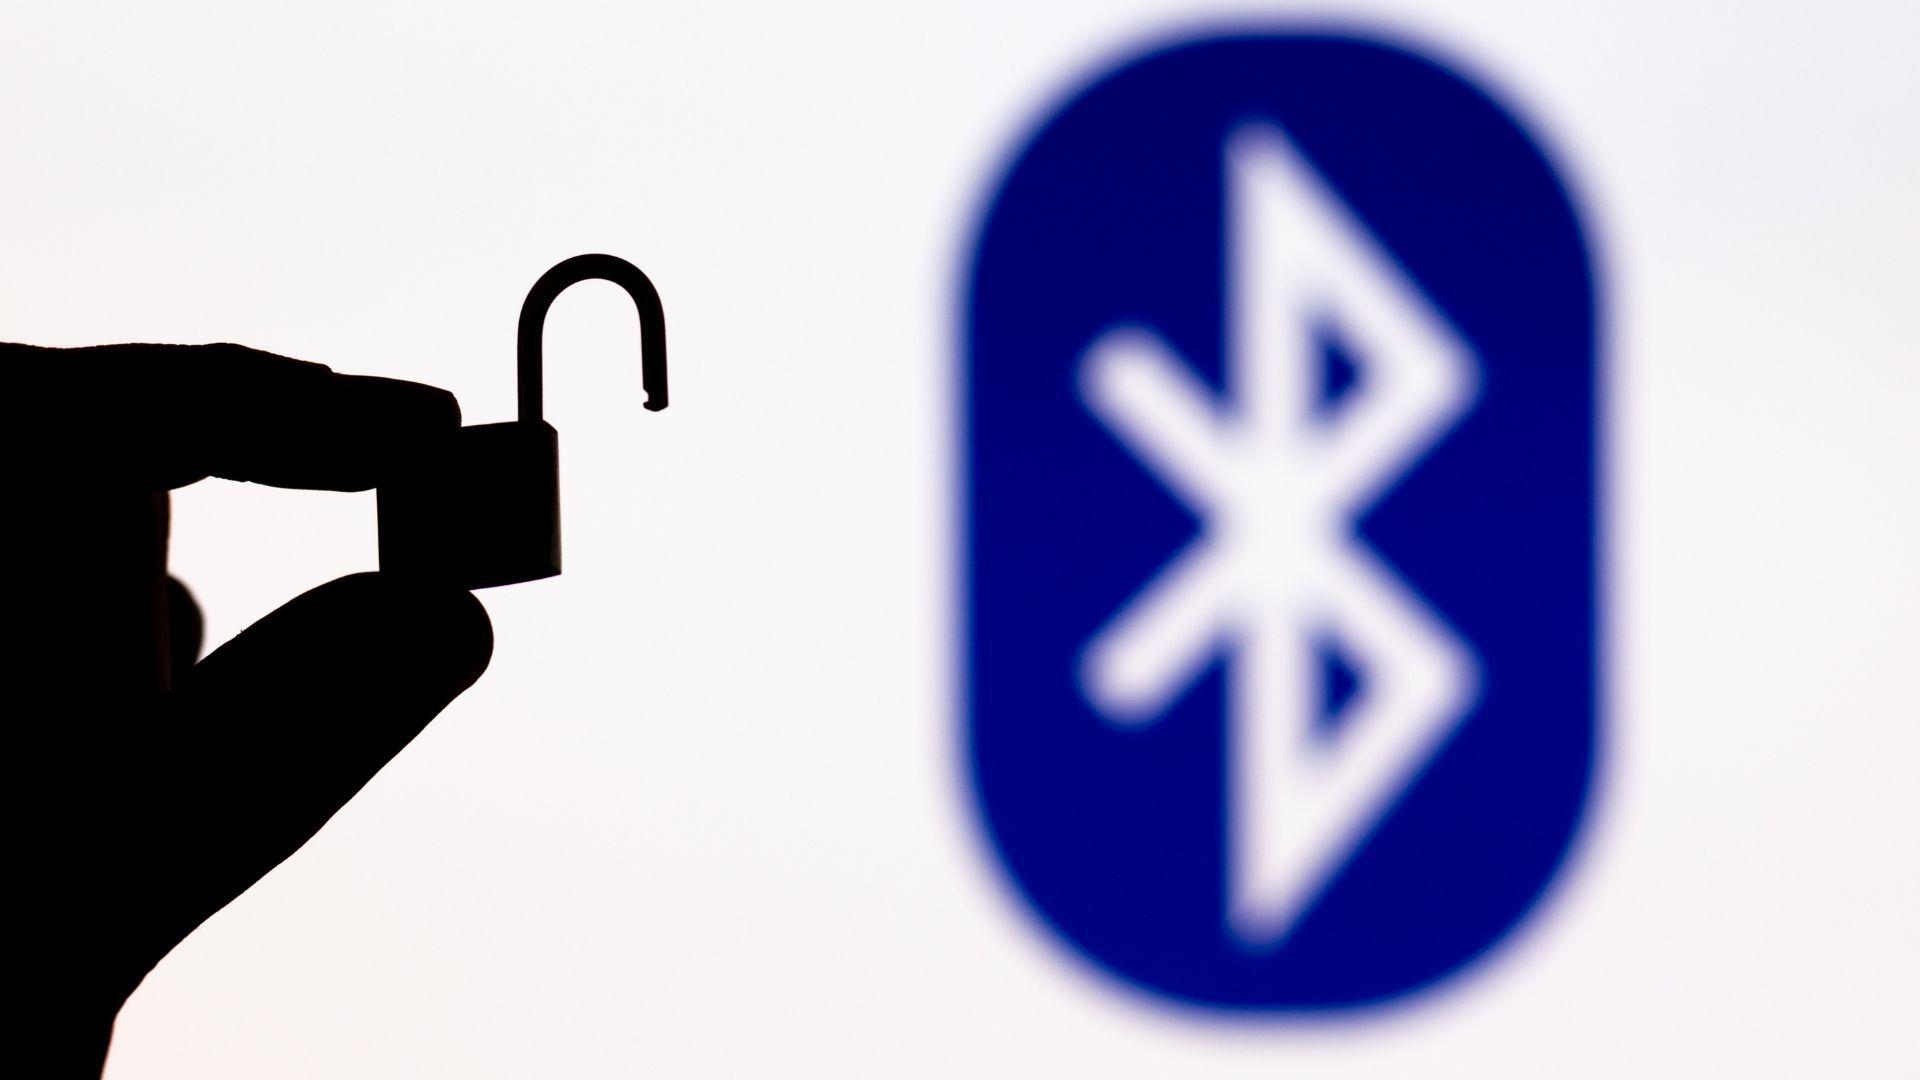 Bluetooth é seguro? (Foto: Alberto Garcia Guillen / Shutterstock.com)